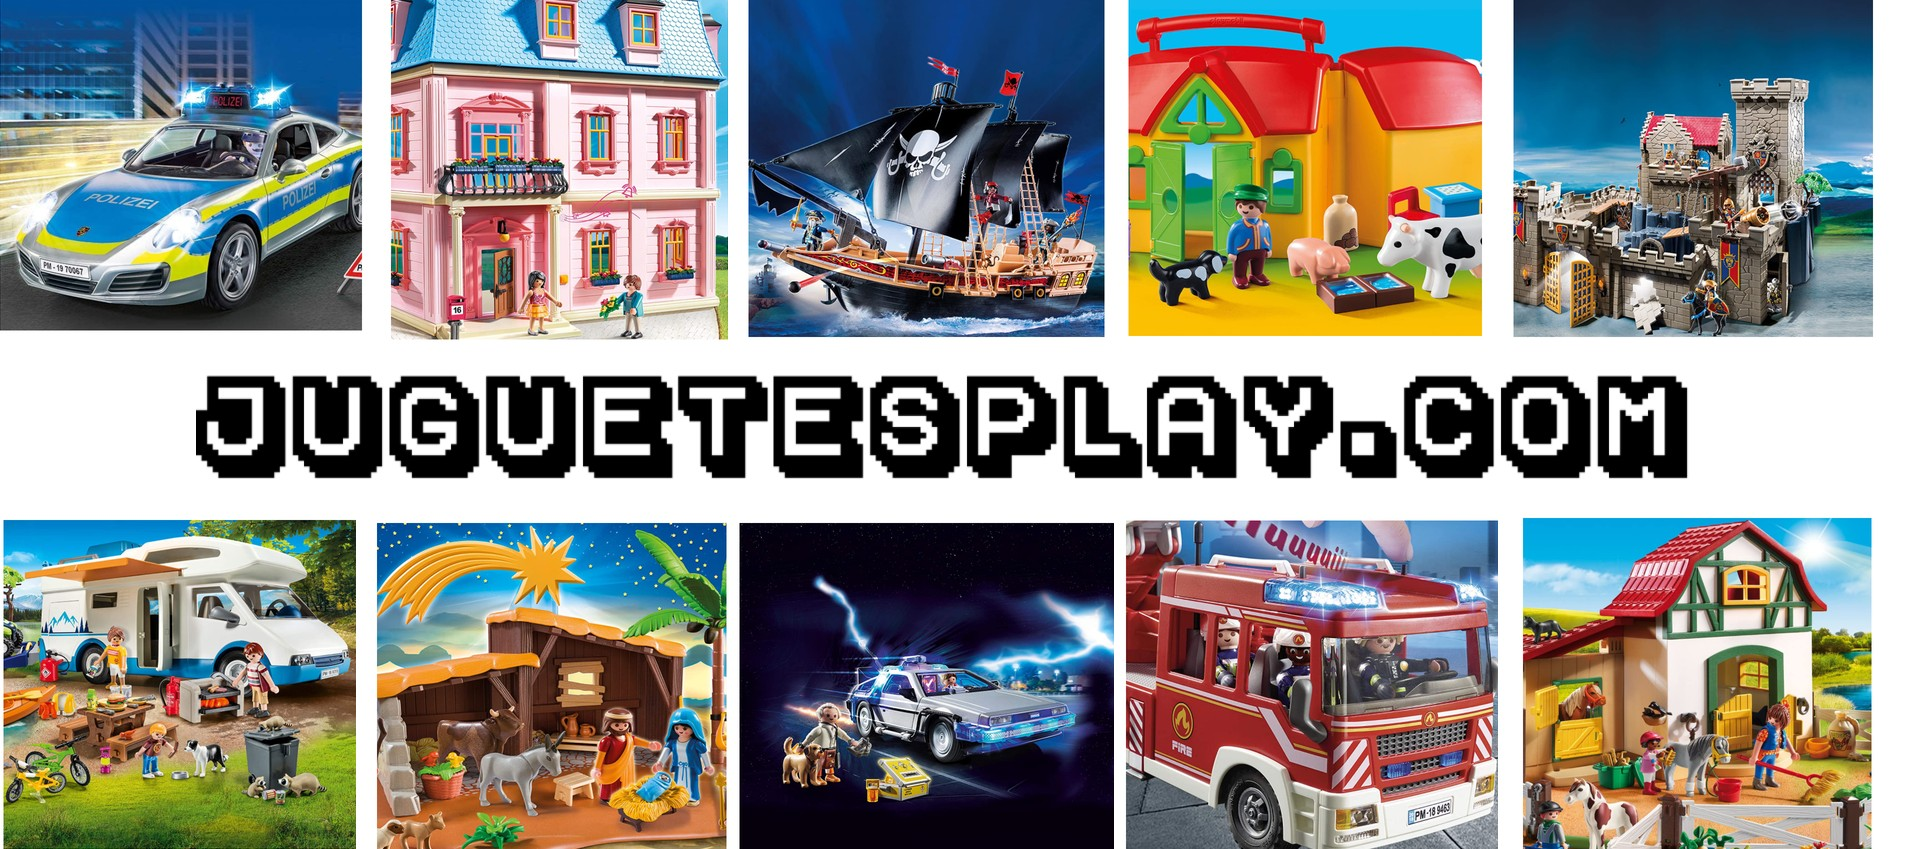 juguetesplay.com